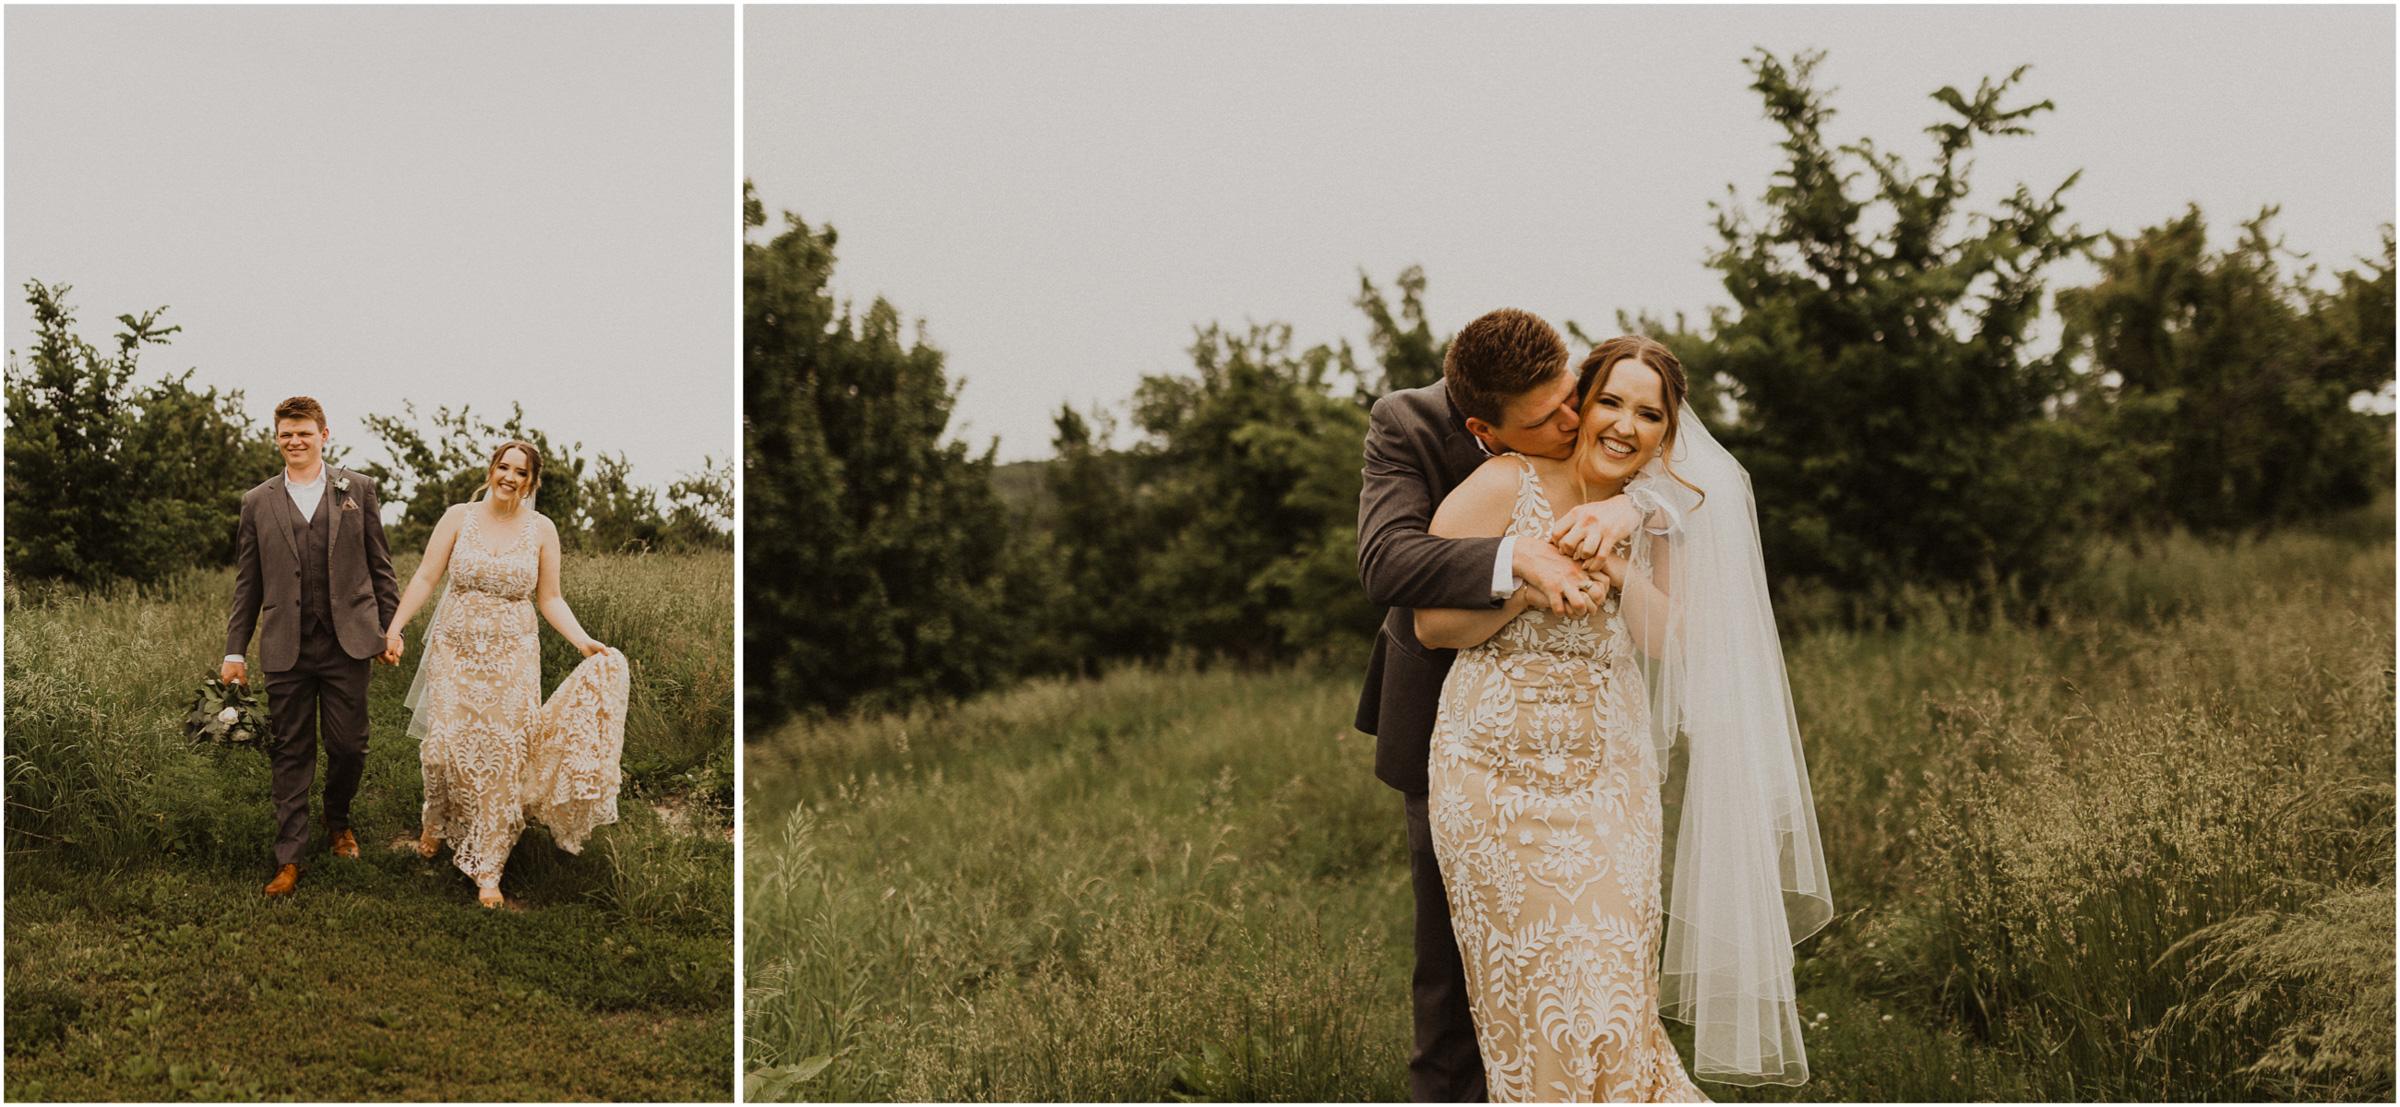 alyssa barletter photography weston red barn farm timberbarn summer outdoor wedding-15.jpg